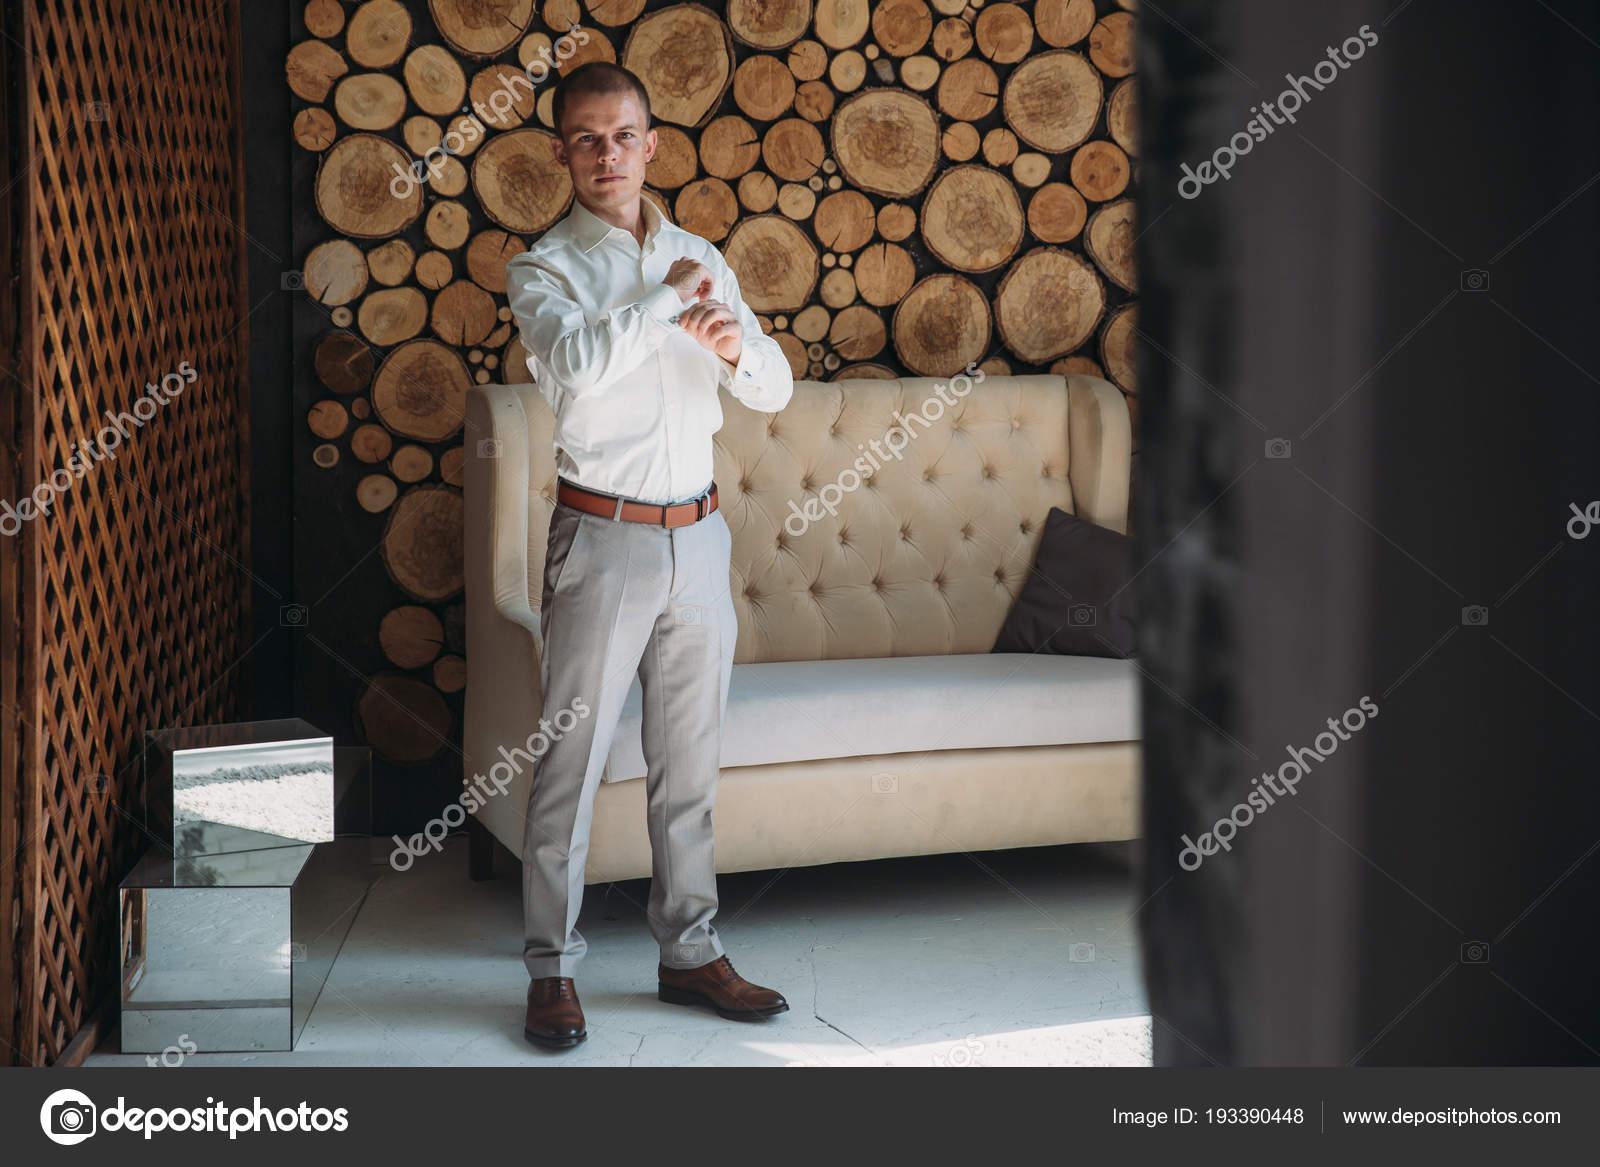 0308081c32cc Προετοιμασία του γαμπρού την ημέρα του γάμου. Ο άνθρωπος φορέματα ένα άσπρο  πουκάμισο και τα μανικετόκουμπα το πρωί στο στούντιο με ένα ξύλινο υπόβαθρο.